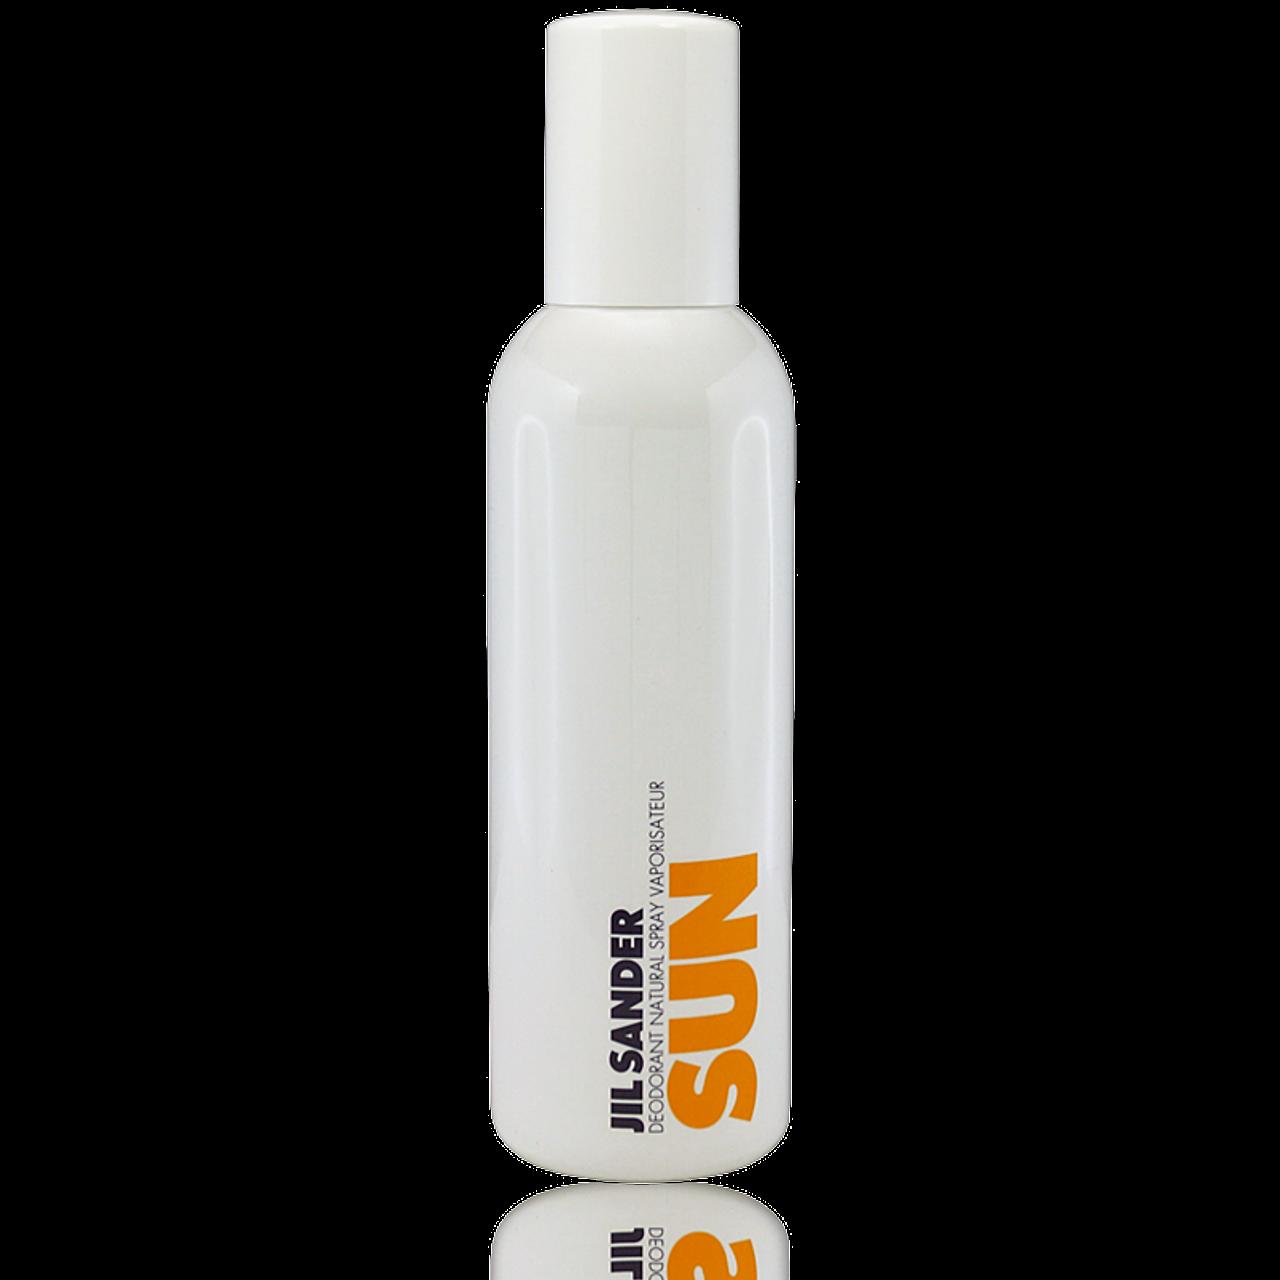 Jil Sander Sun Deo Spray 100ml